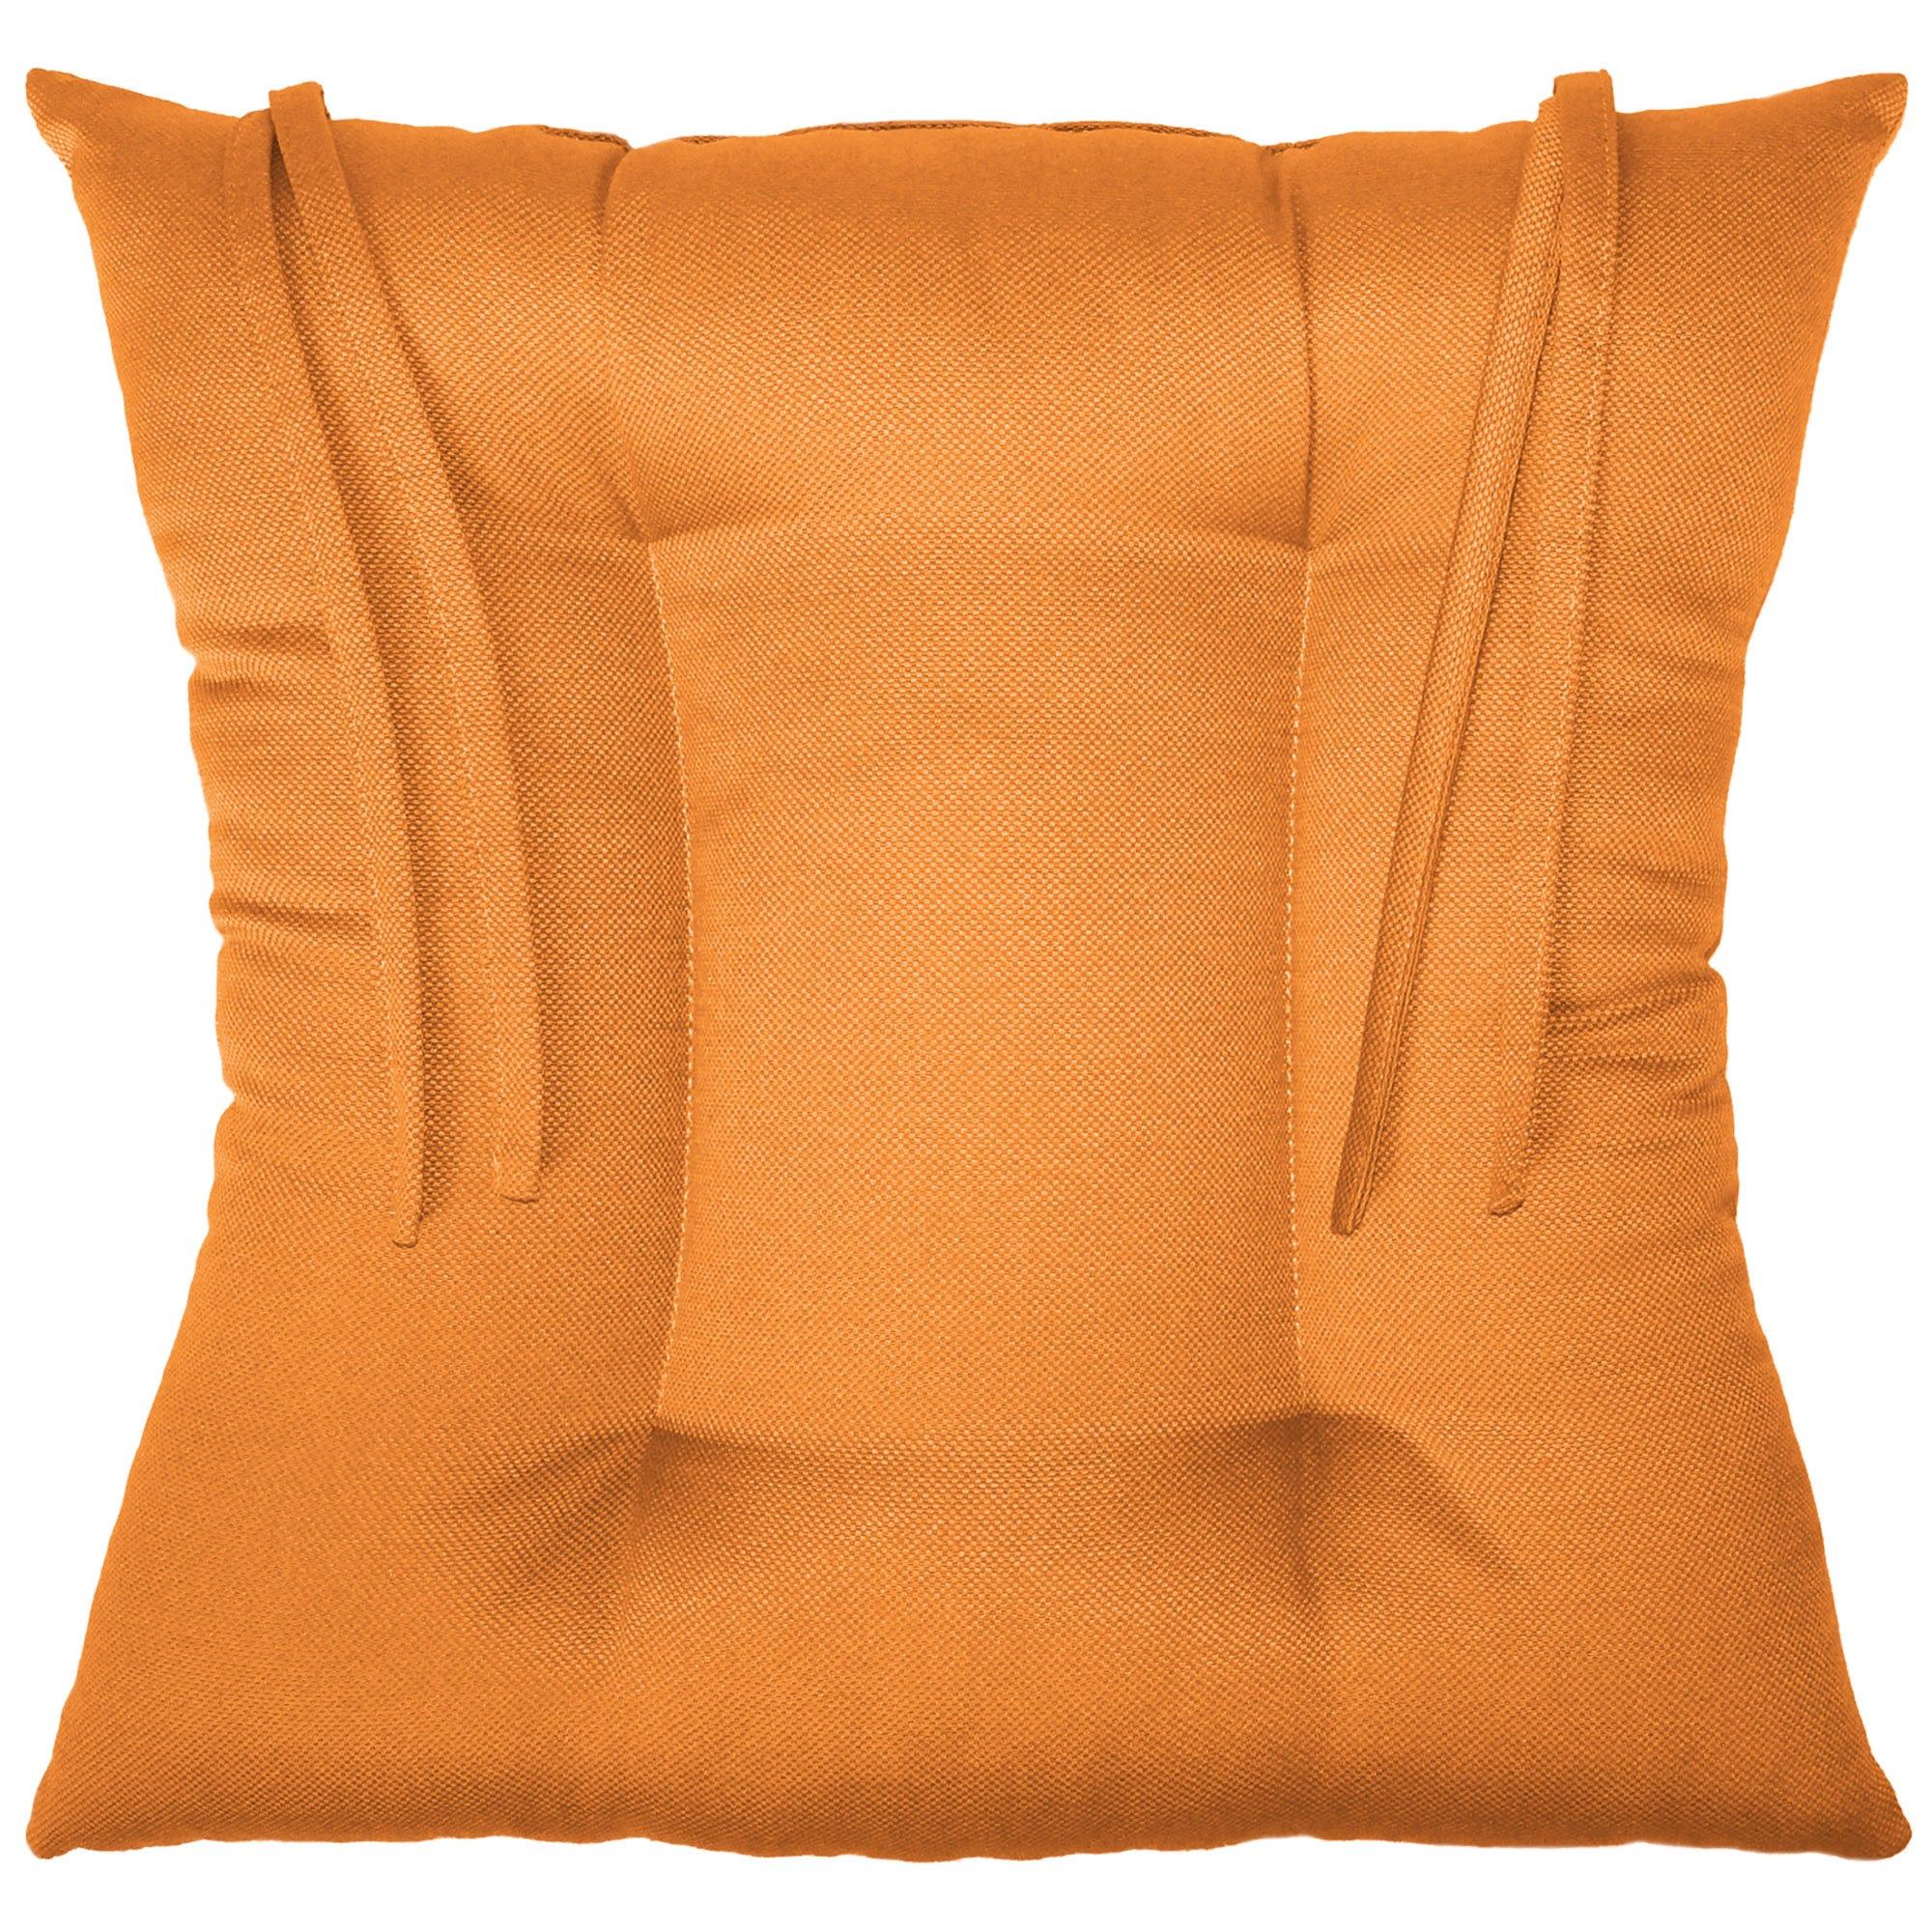 Cojín para silla color naranja